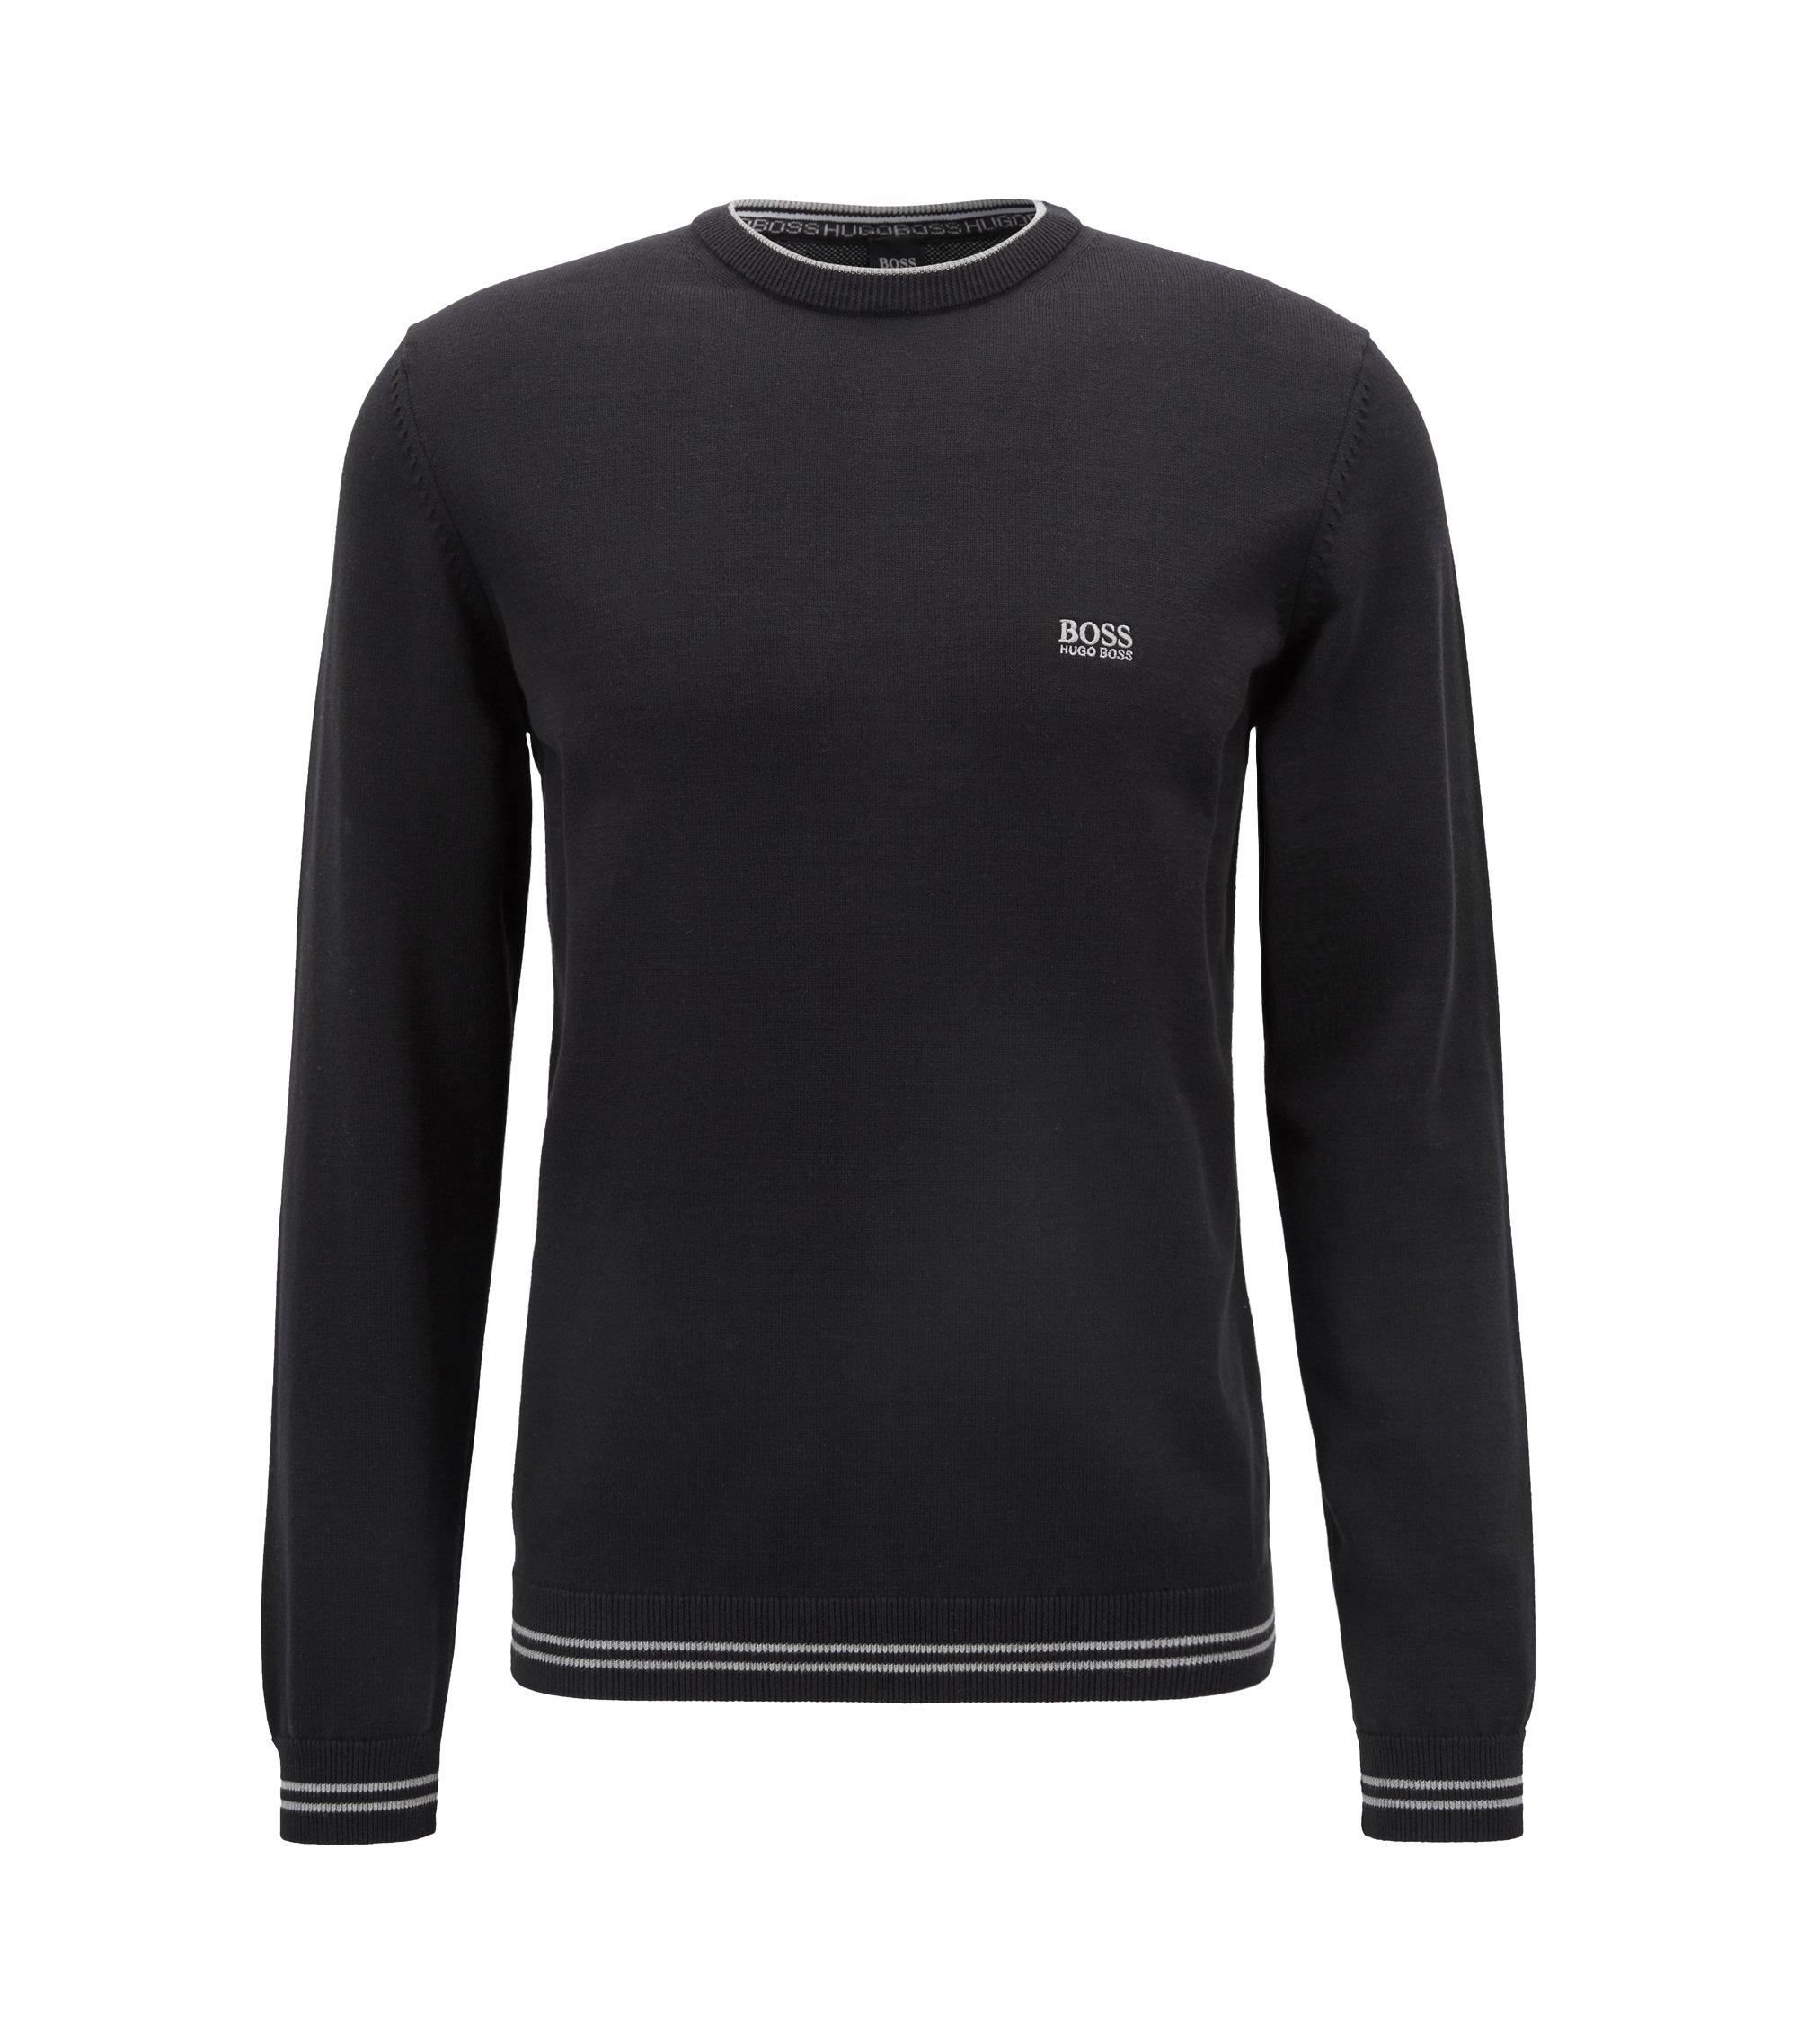 Gebreide trui met contrasterende rand en ingebreid logo, Zwart